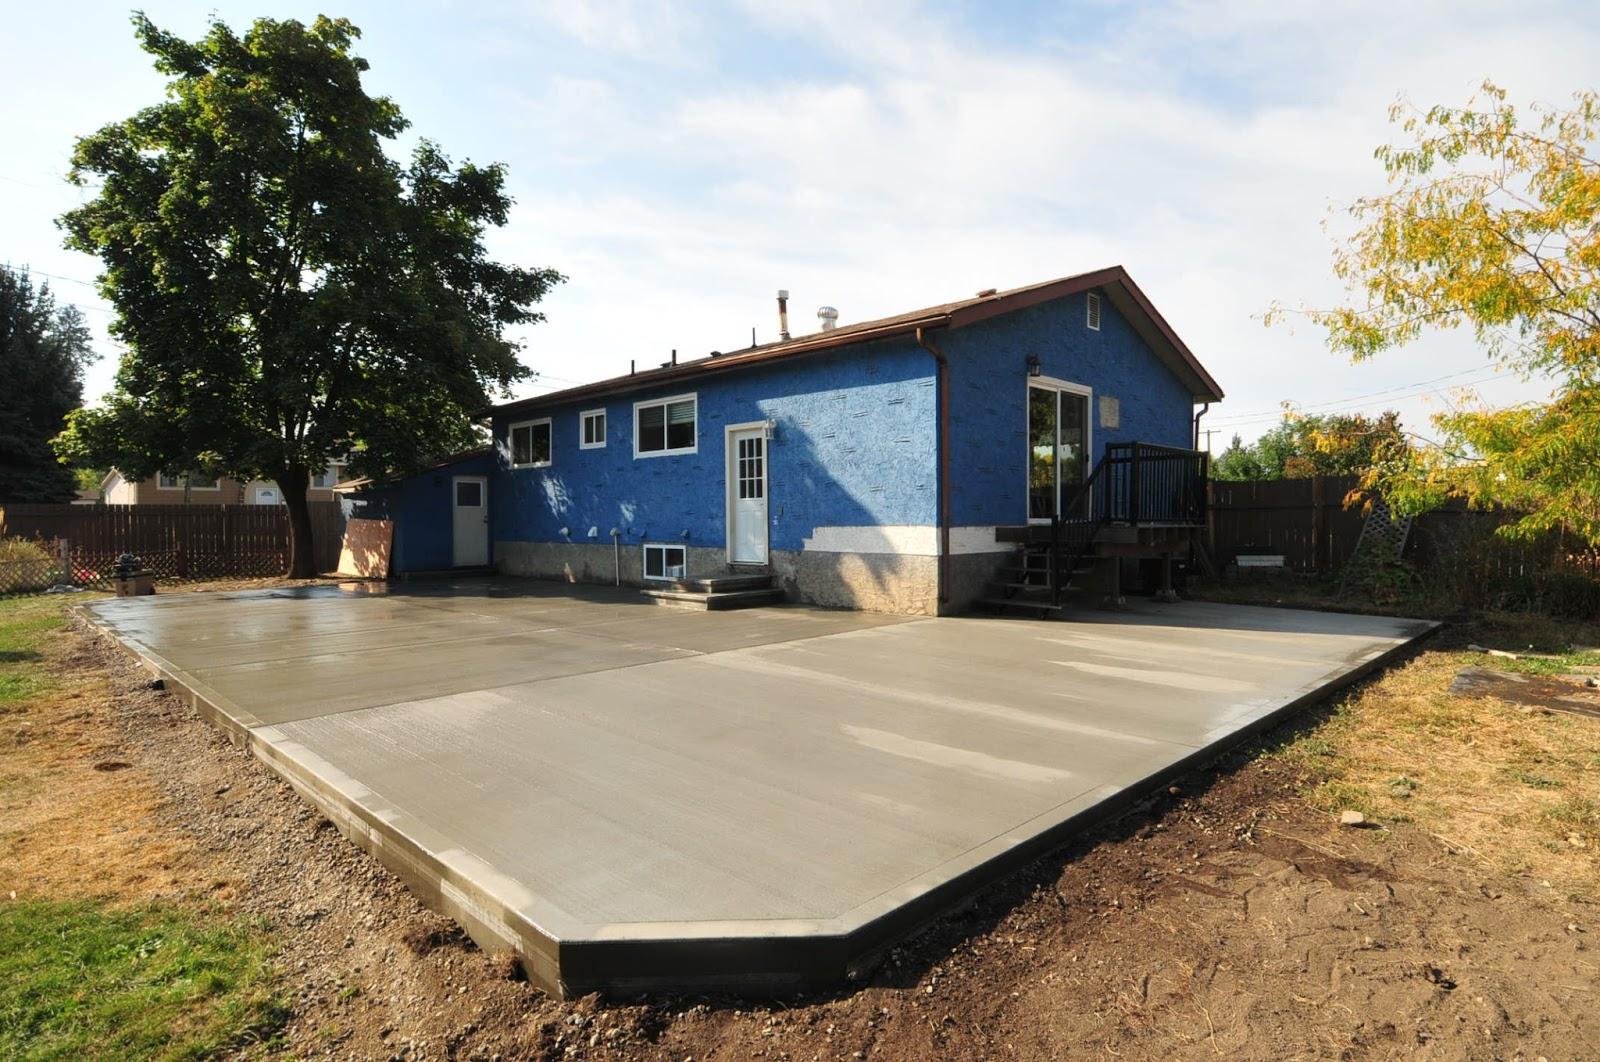 MODE CONCRETE: Concrete Patios, Concrete Stairs, Concrete ... on Concrete Slab Backyard Ideas id=58846